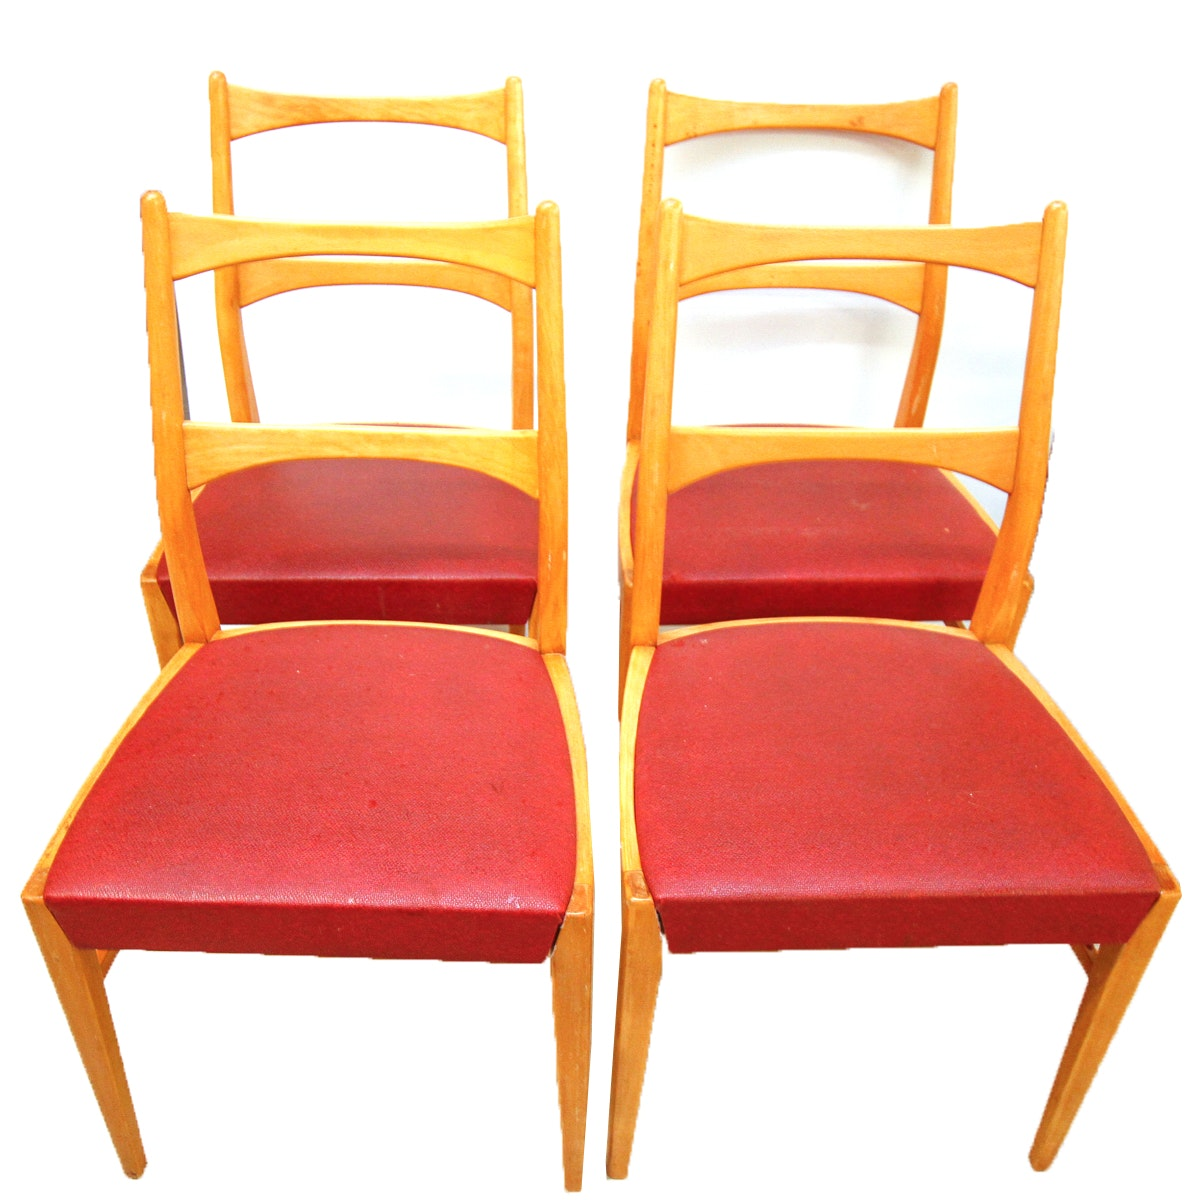 Danish Modern Beech Chairs With Red Vinyl Seats ...